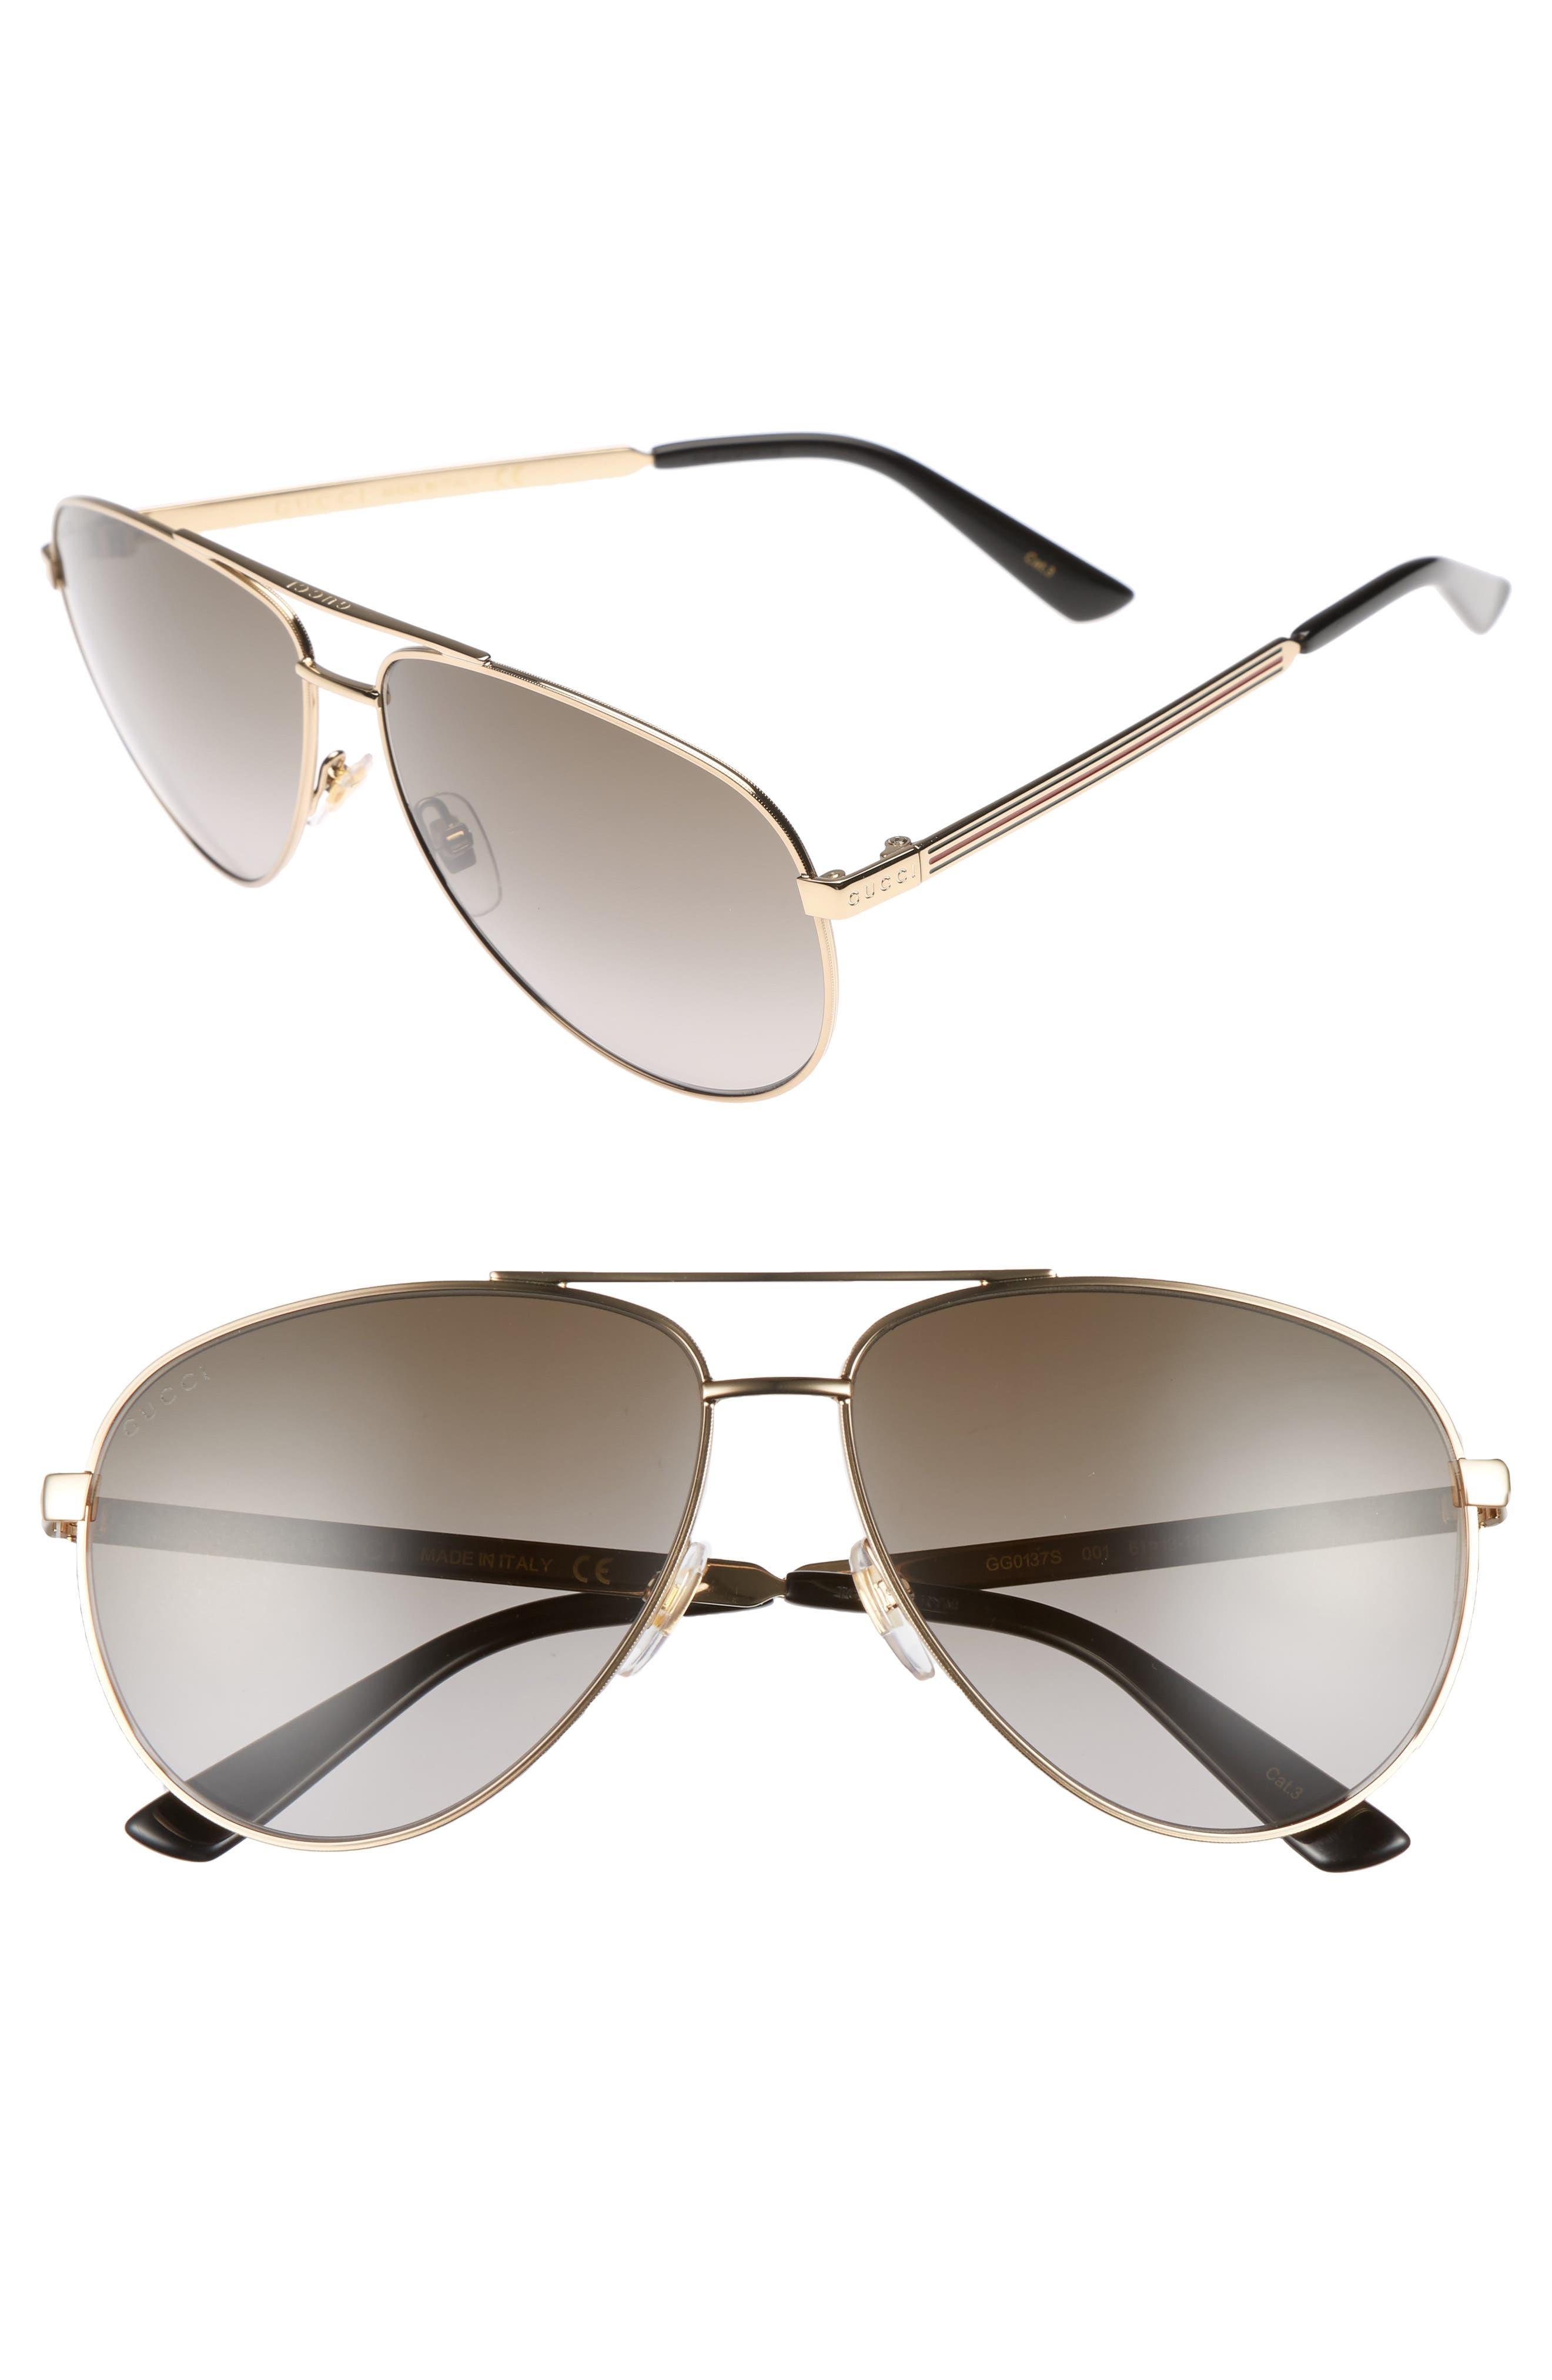 61mm Aviator Sunglasses,                             Main thumbnail 1, color,                             GOLD/BROWN